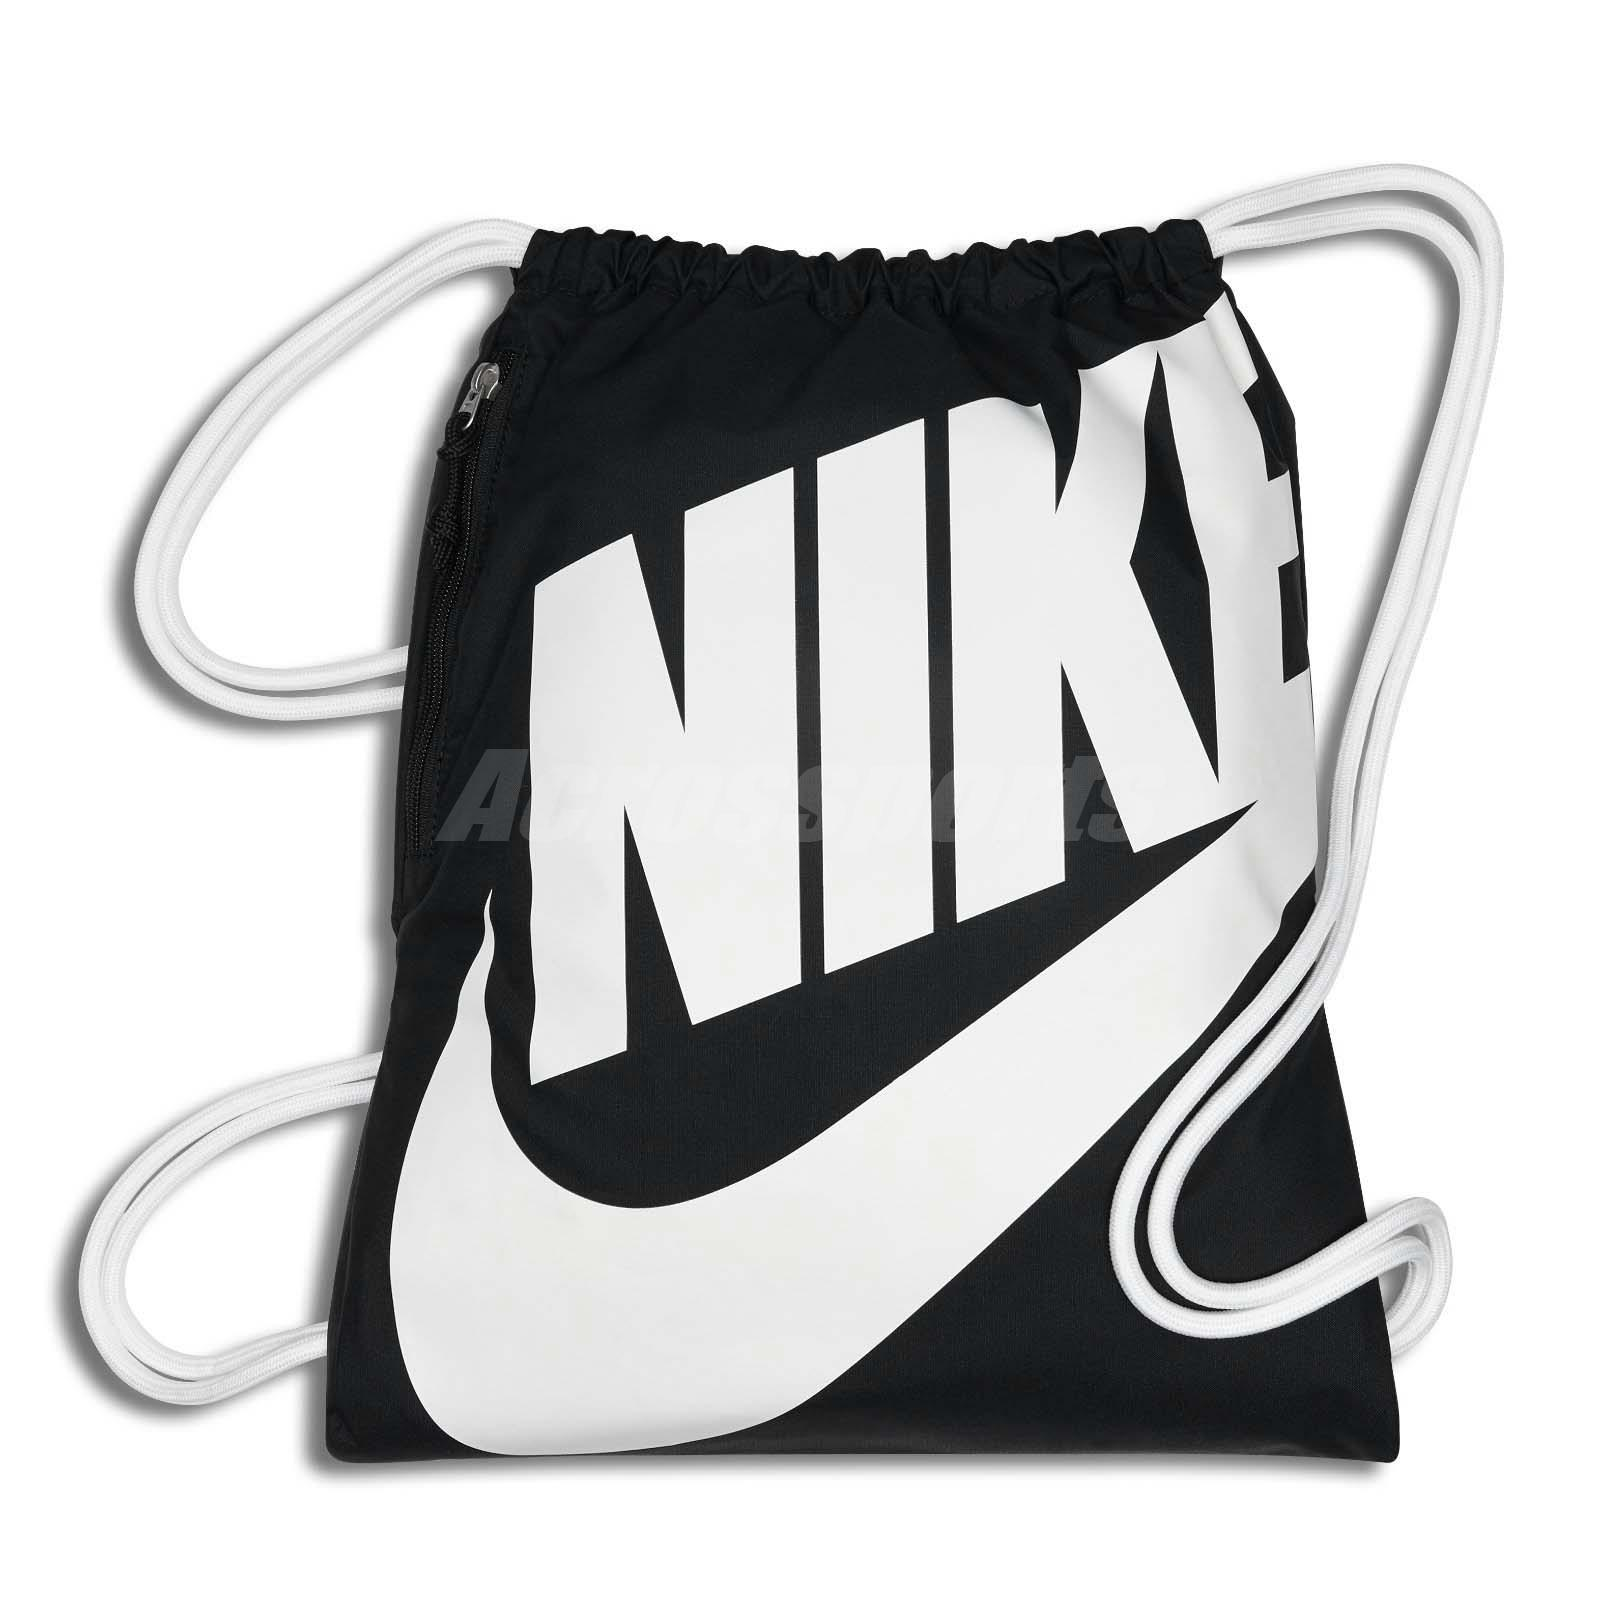 Nike Unisex Heritage Gymsack Training Running Fitness Sport Bag Black  BA5351-011 4ee3b12ebaf69